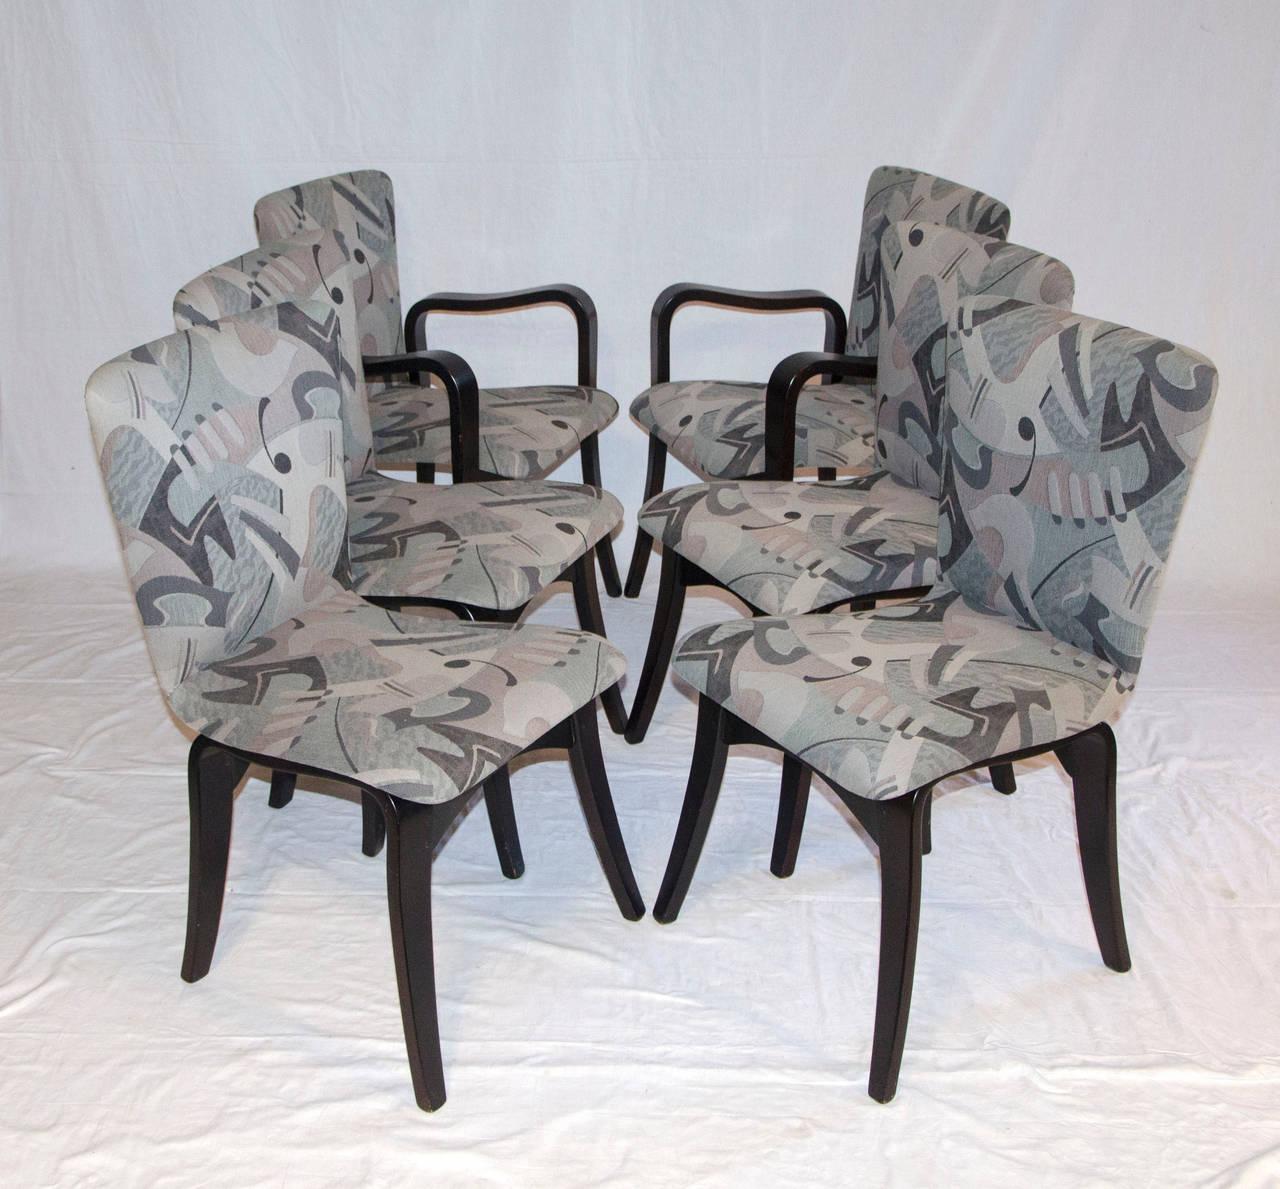 Mid-Century Modern Mid Century Bent Ply Dining Chairs - Thaden-Jordan For Sale